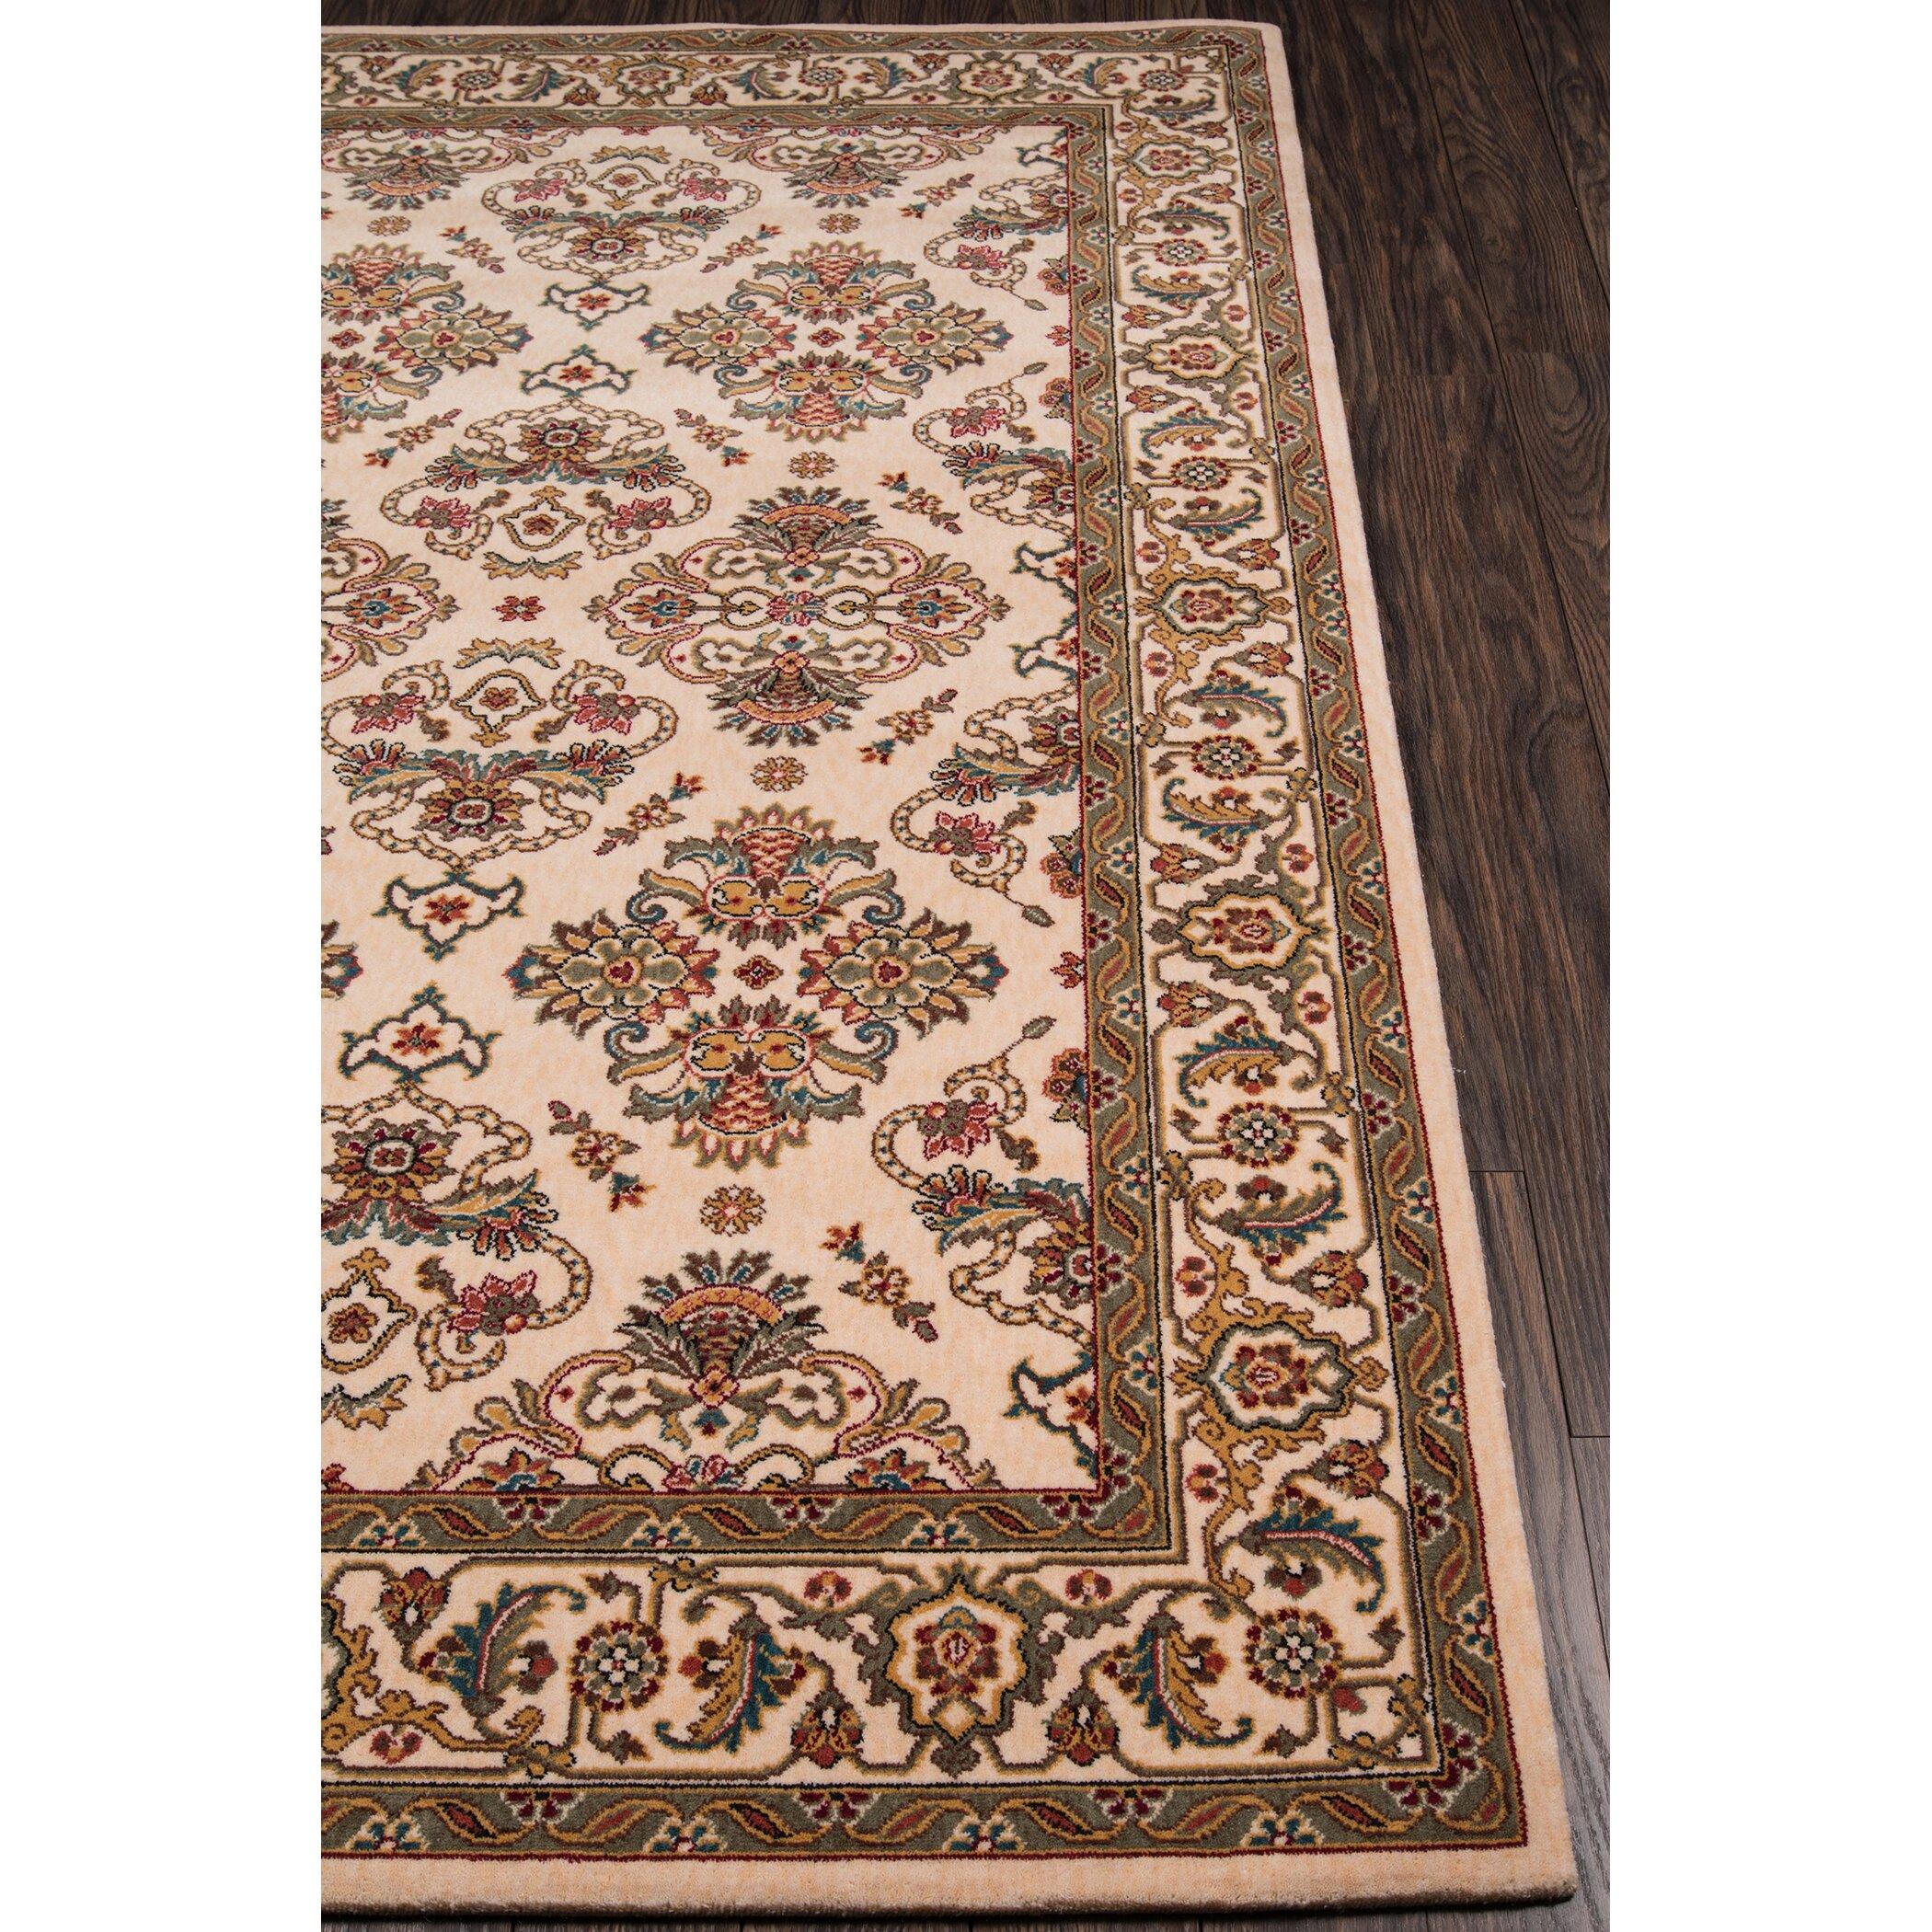 Momeni persian garden ivory area rug reviews wayfair for Momeni rugs